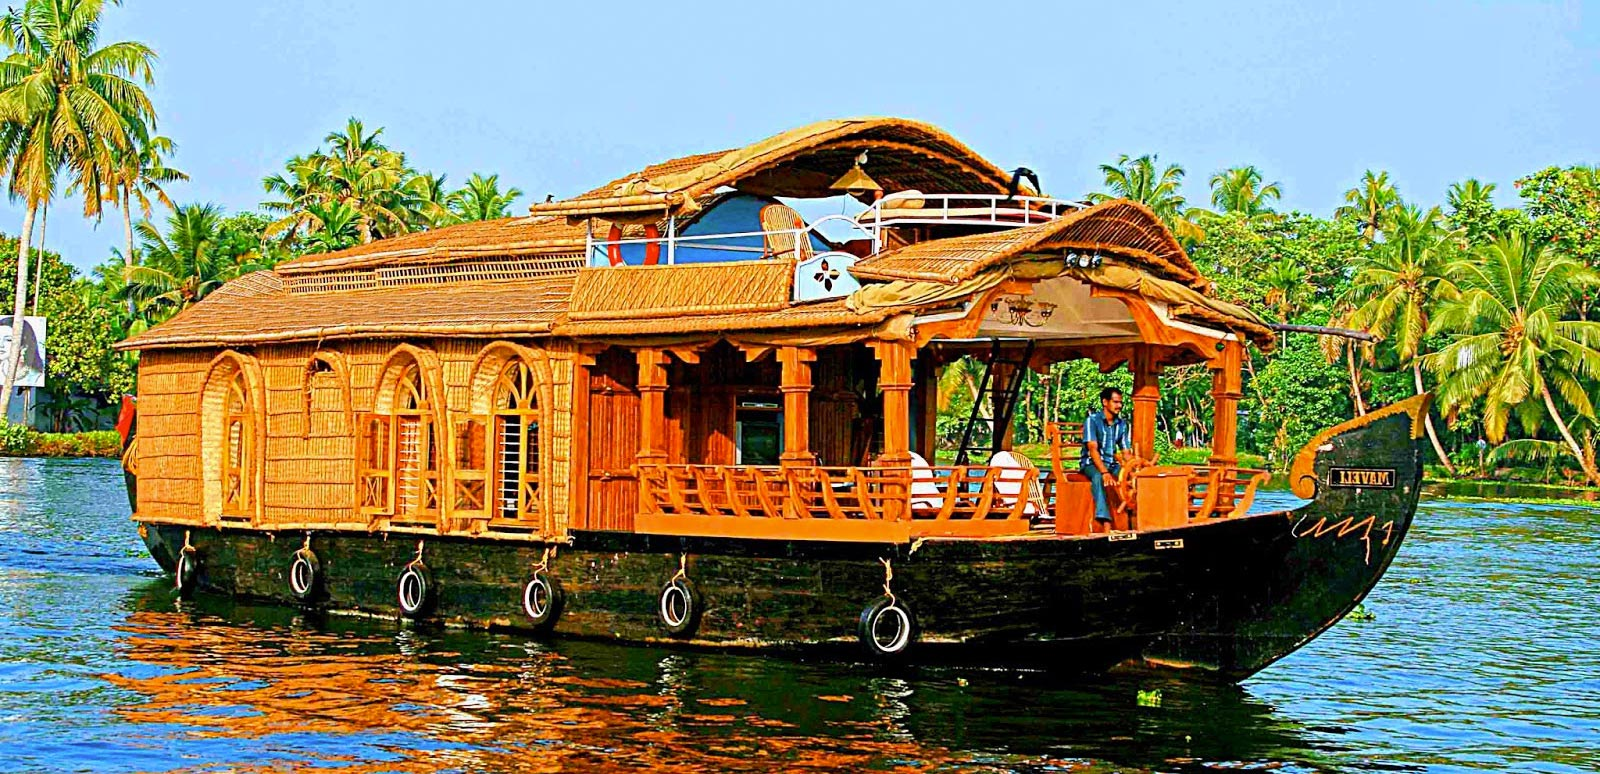 Alappuzha-india5 Descubre los paisajes de Alappuzha en la India